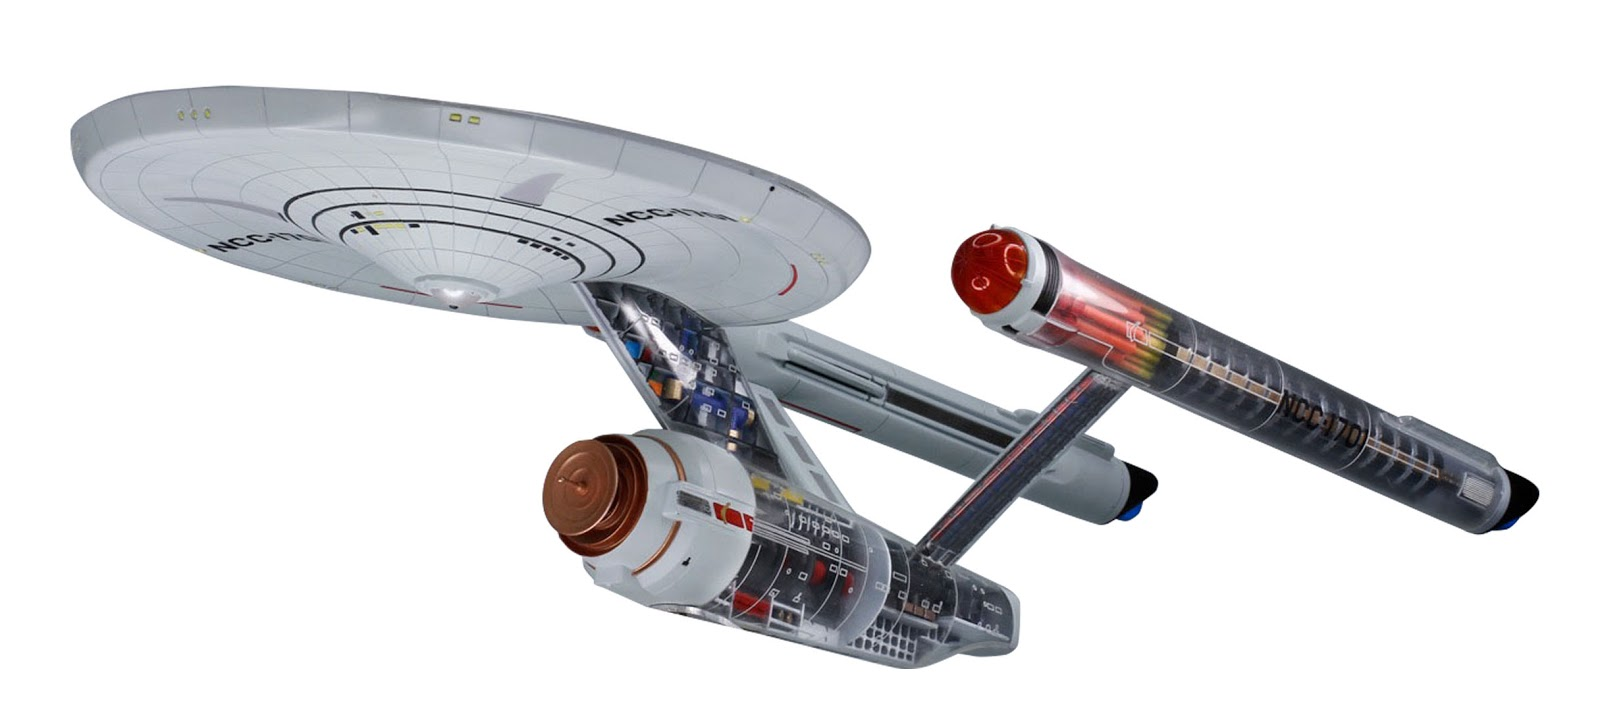 uss enterprise diagram land cruiser 120 wiring the trek collective slicing up cutaway models and diagrams